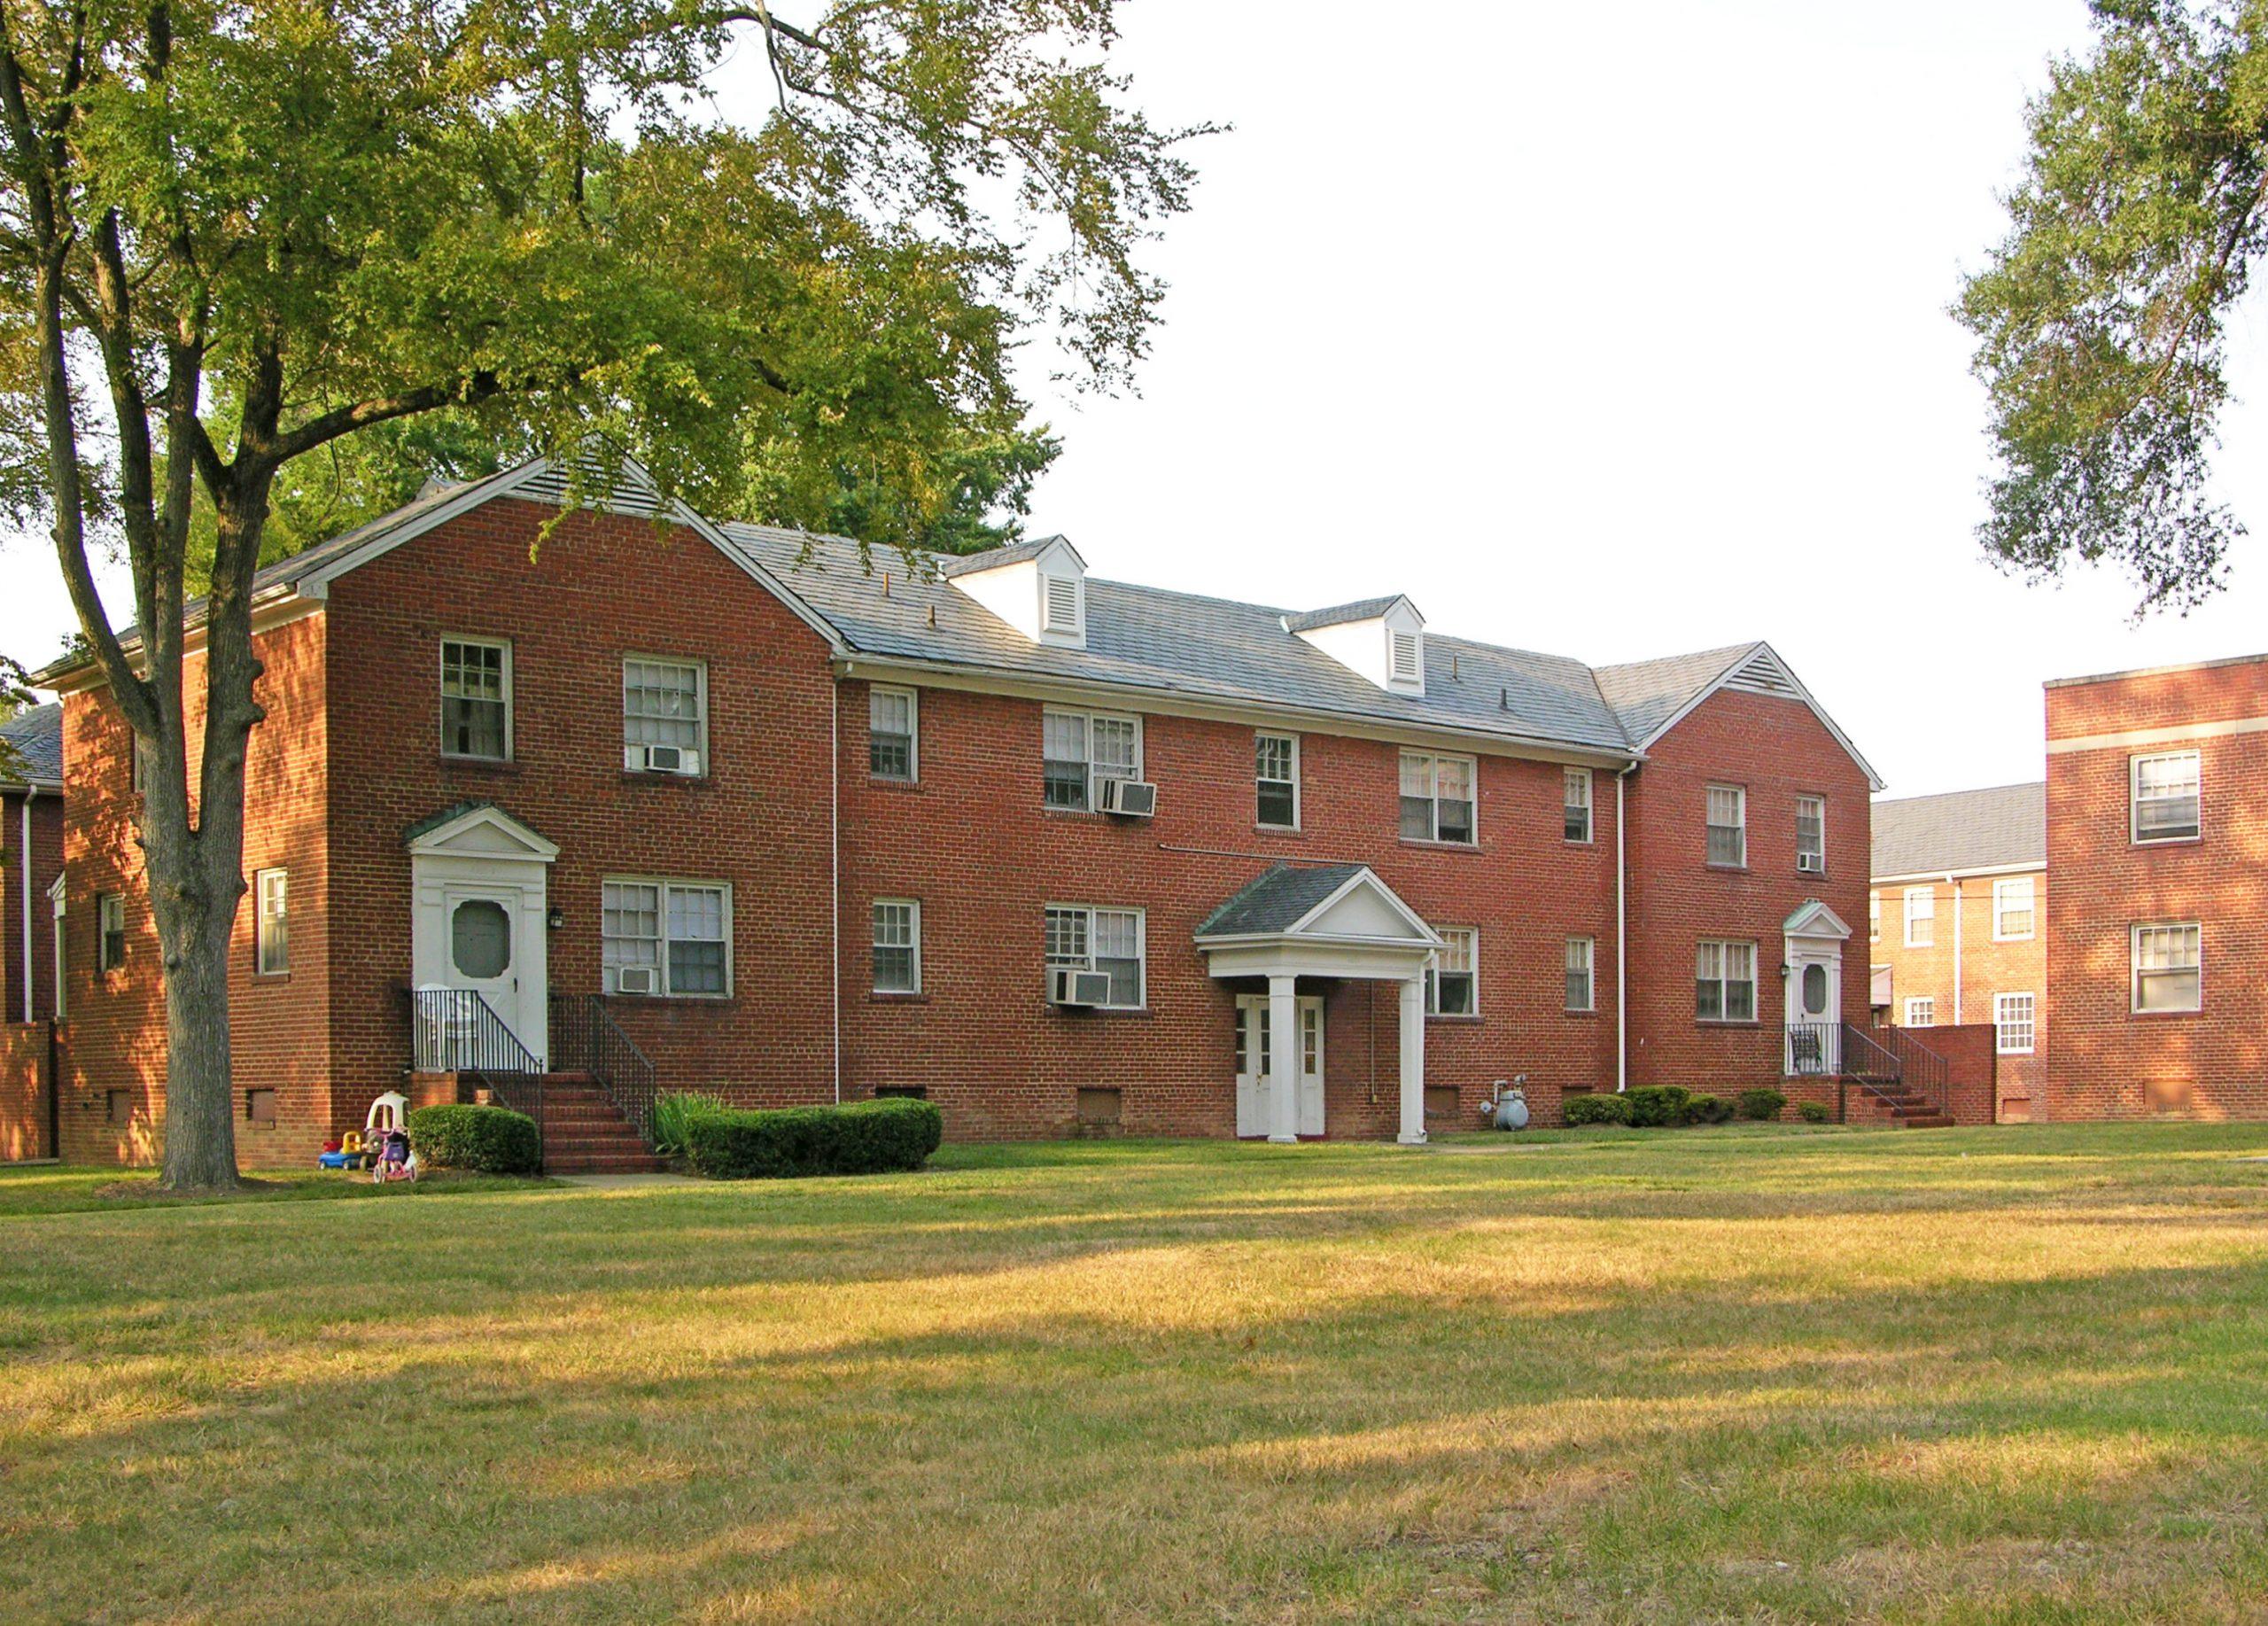 Federal Housing Administration-Insured Garden Apartments, Richmond 1942-1950 MPD